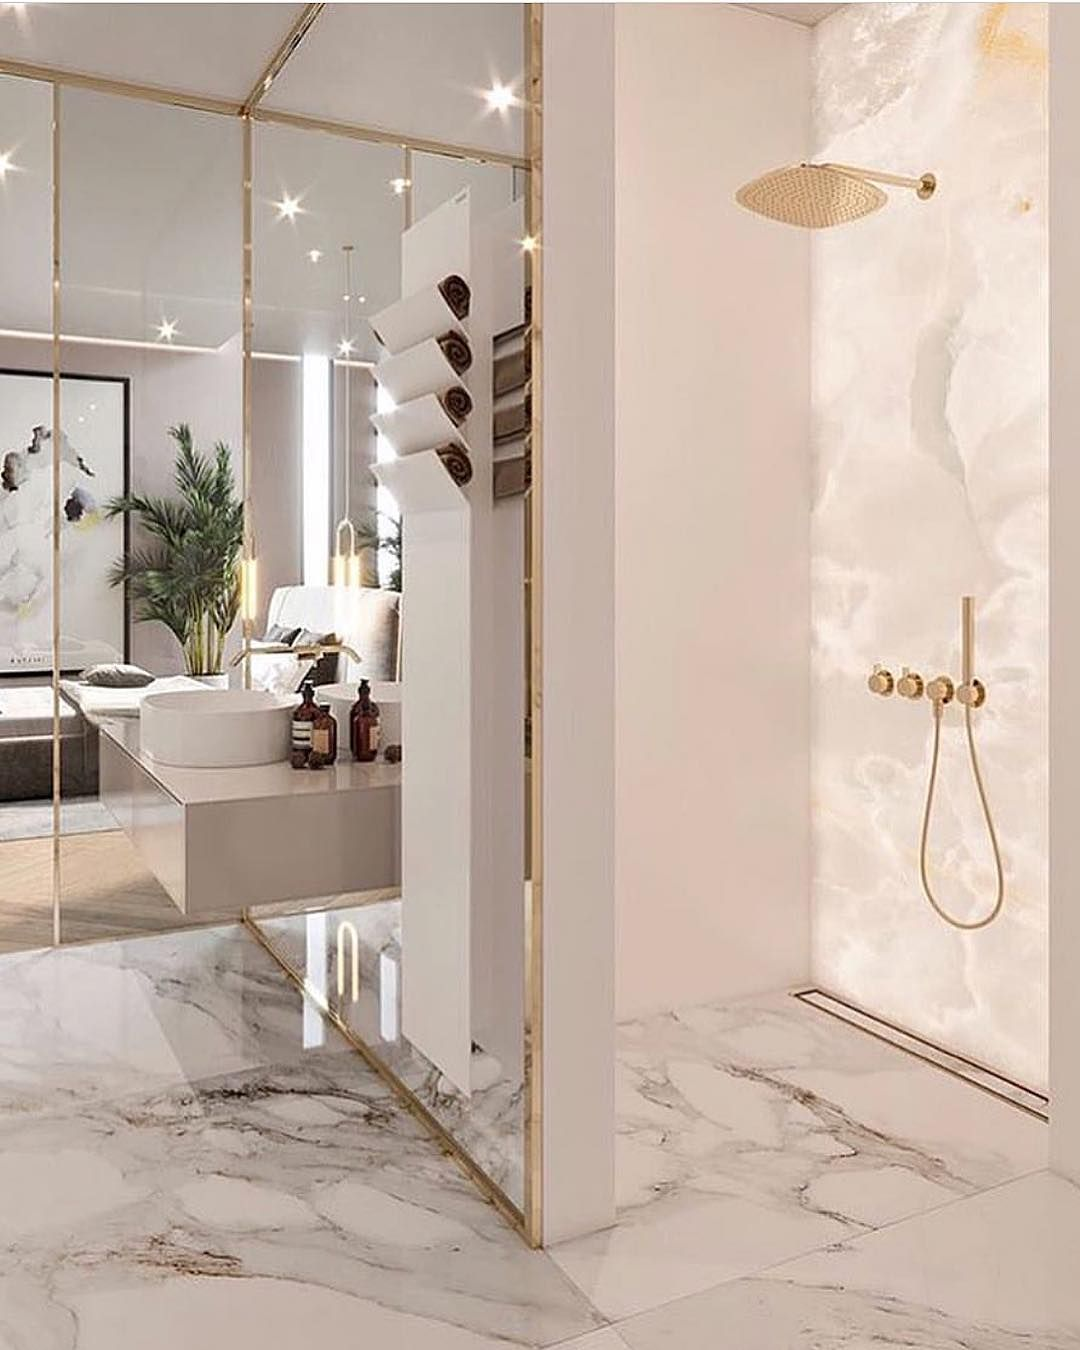 "Home Design Ideas Instagram: Interior Design & Home Decor On Instagram: ""Let's Talk"